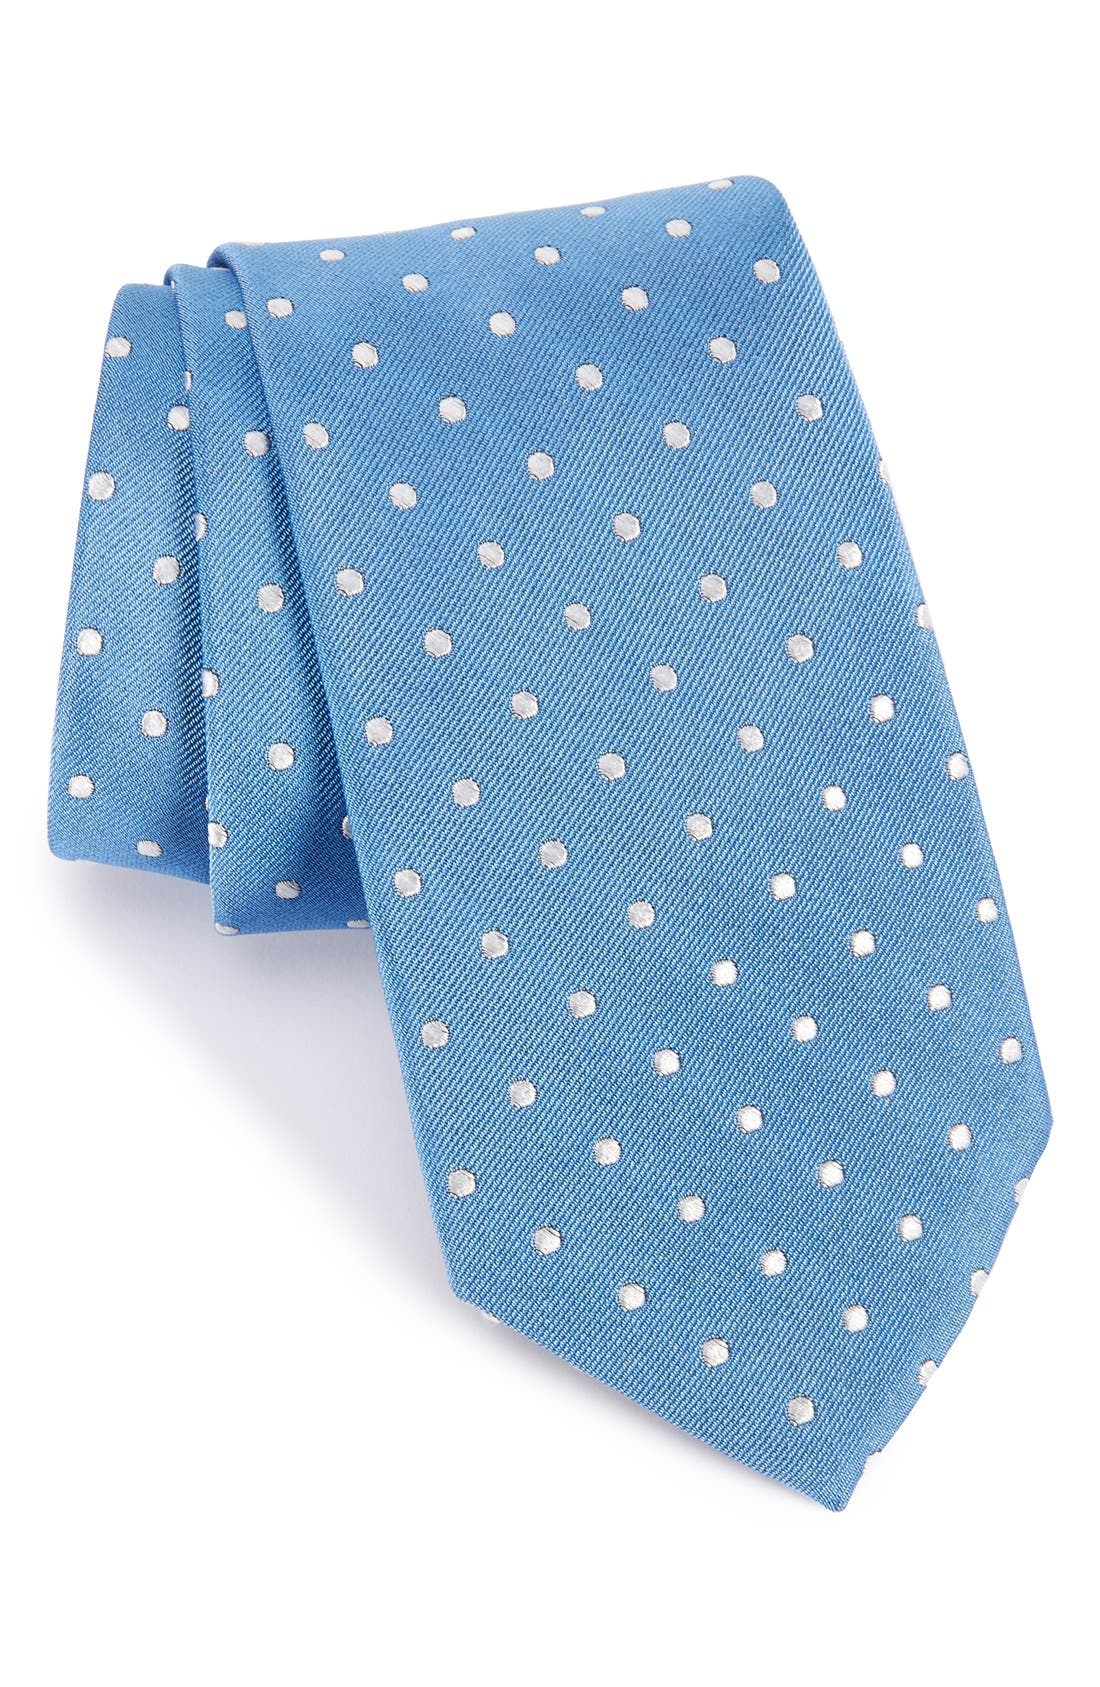 Main Image - Gitman Polka Dot Silk Tie (X-Long)